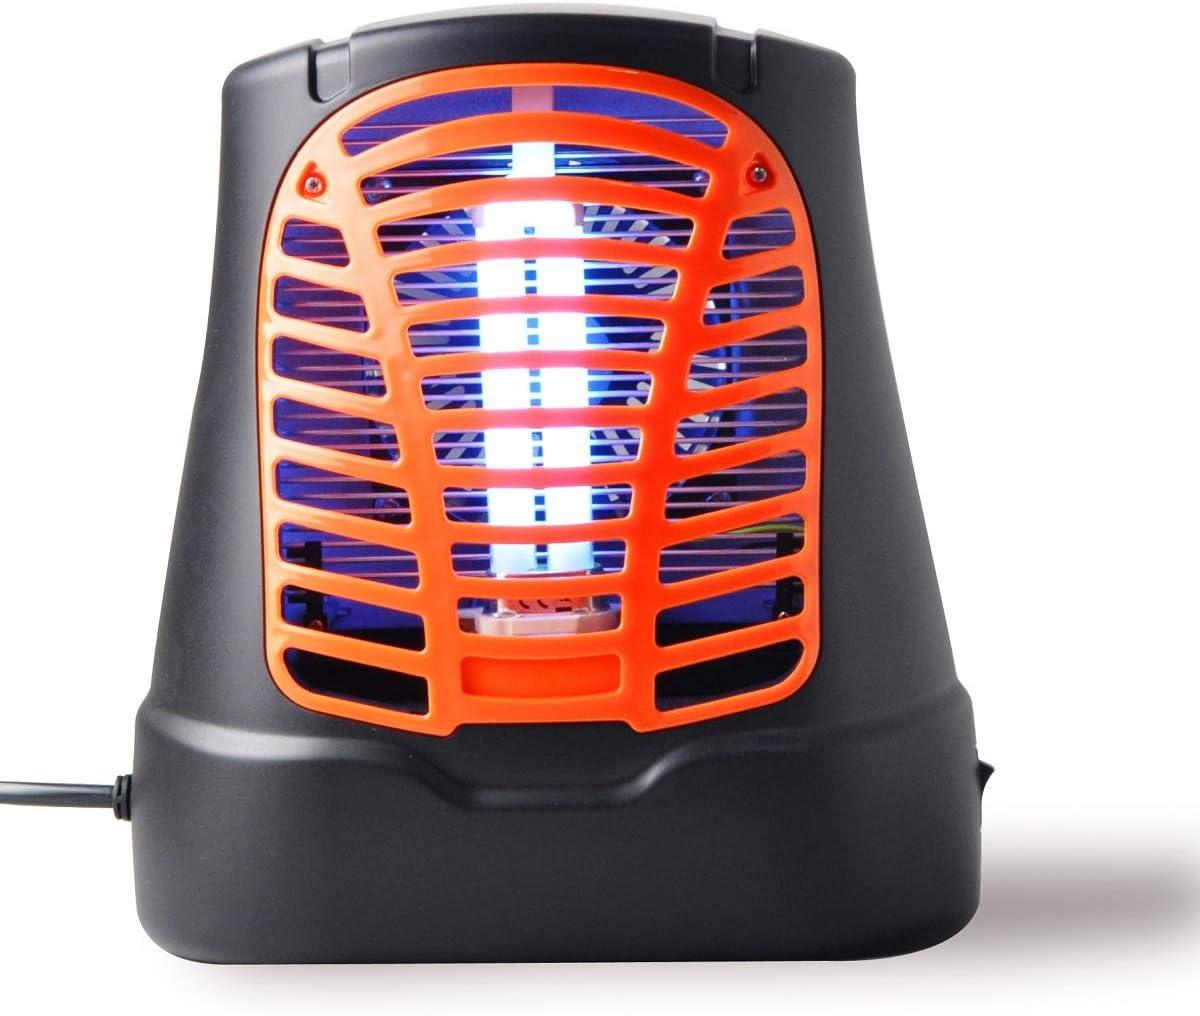 Armadilha para Mosquitos Bug Trap RelaxMedic RM-AI1515